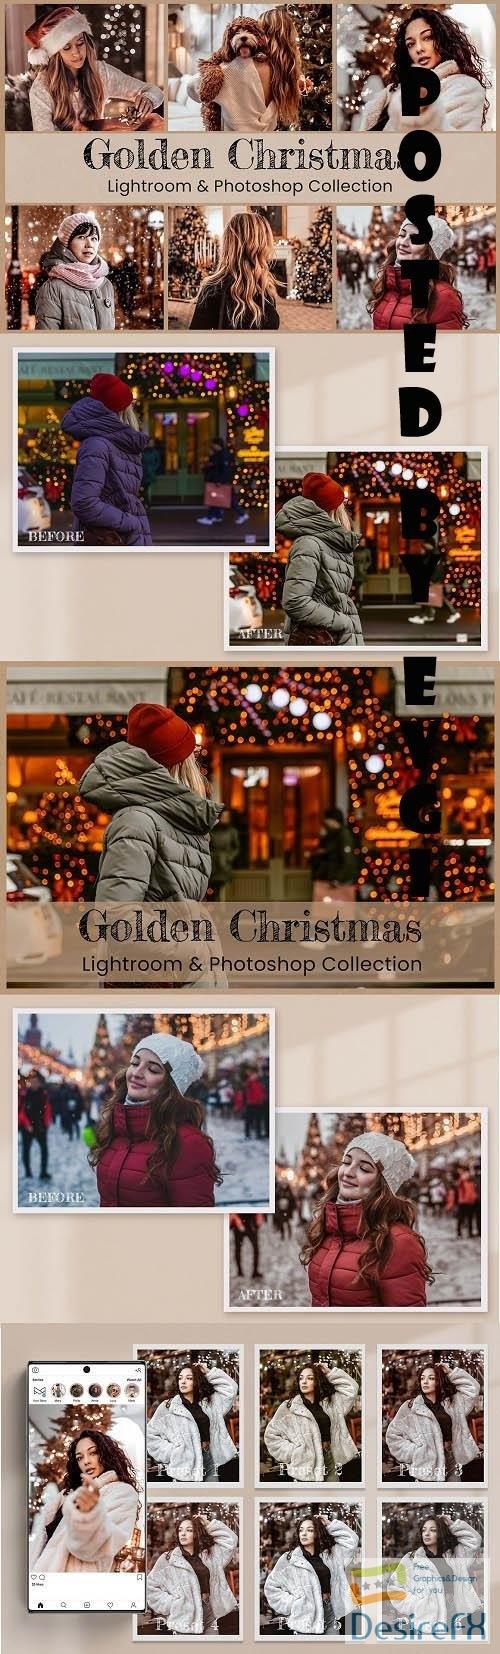 Golden Christmas Lightroom Photoshop - 6570666